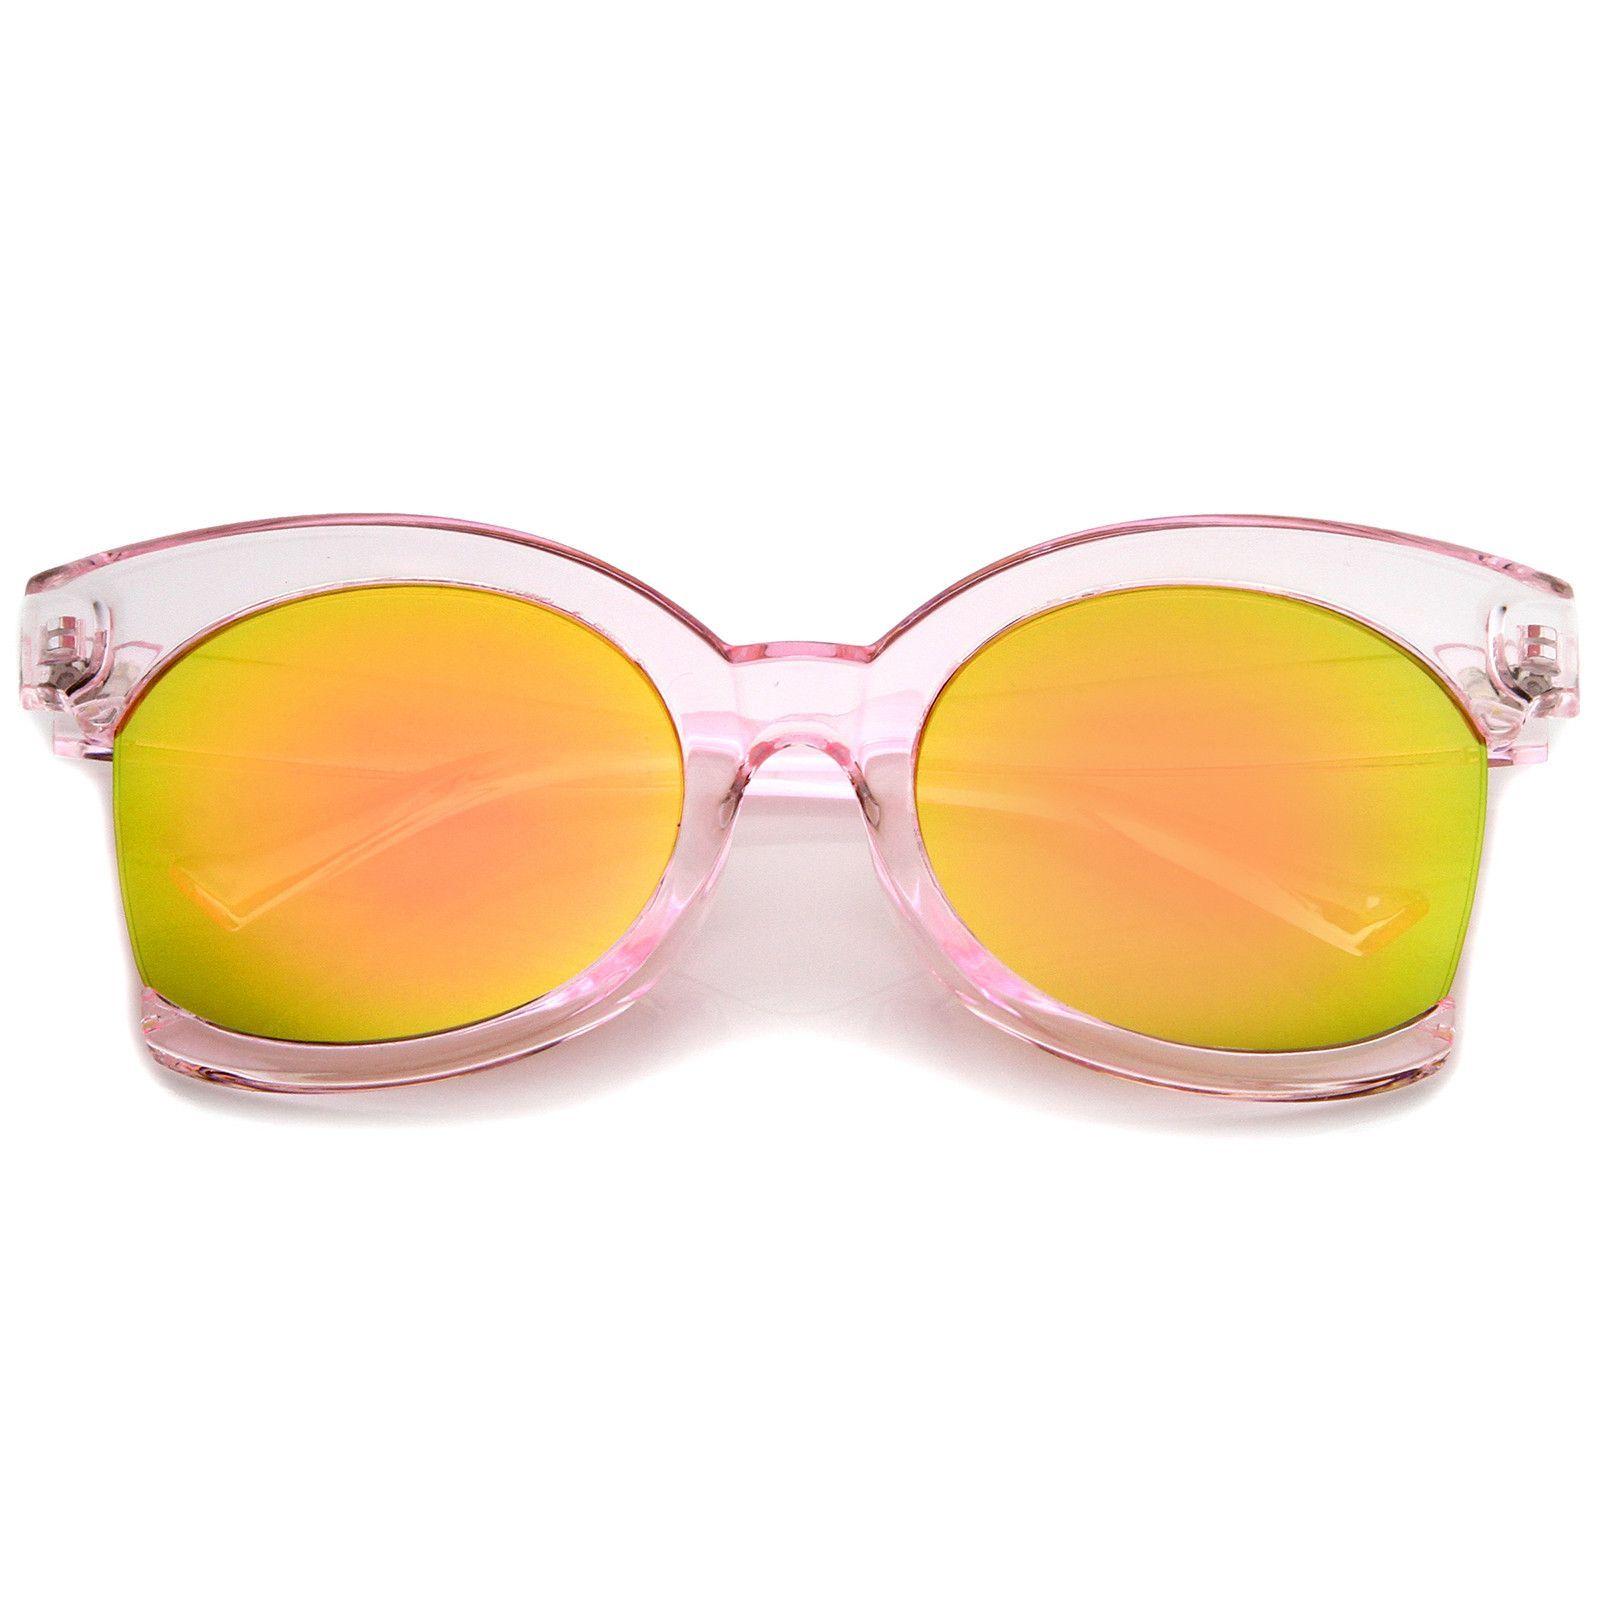 Women's Oversize Side Cut Transparent Frame Colored Mirror Cat Eye Sunglasses 59mm